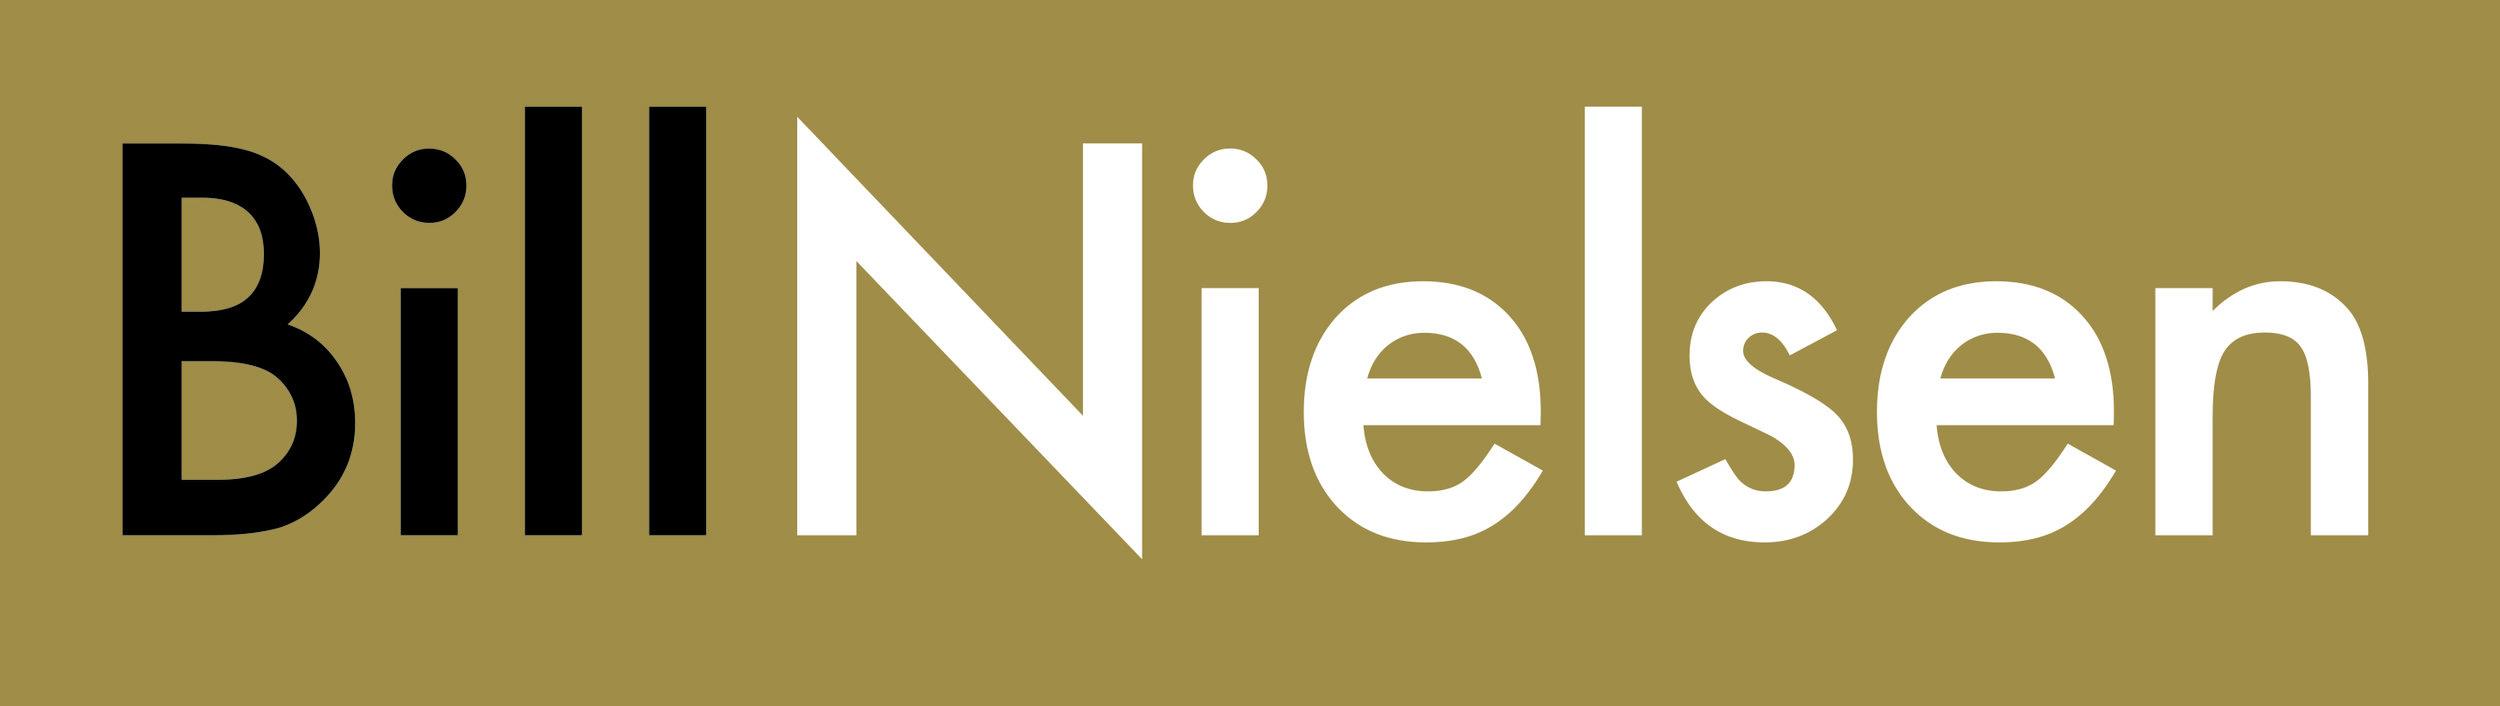 logo-bill-nielsen.jpg